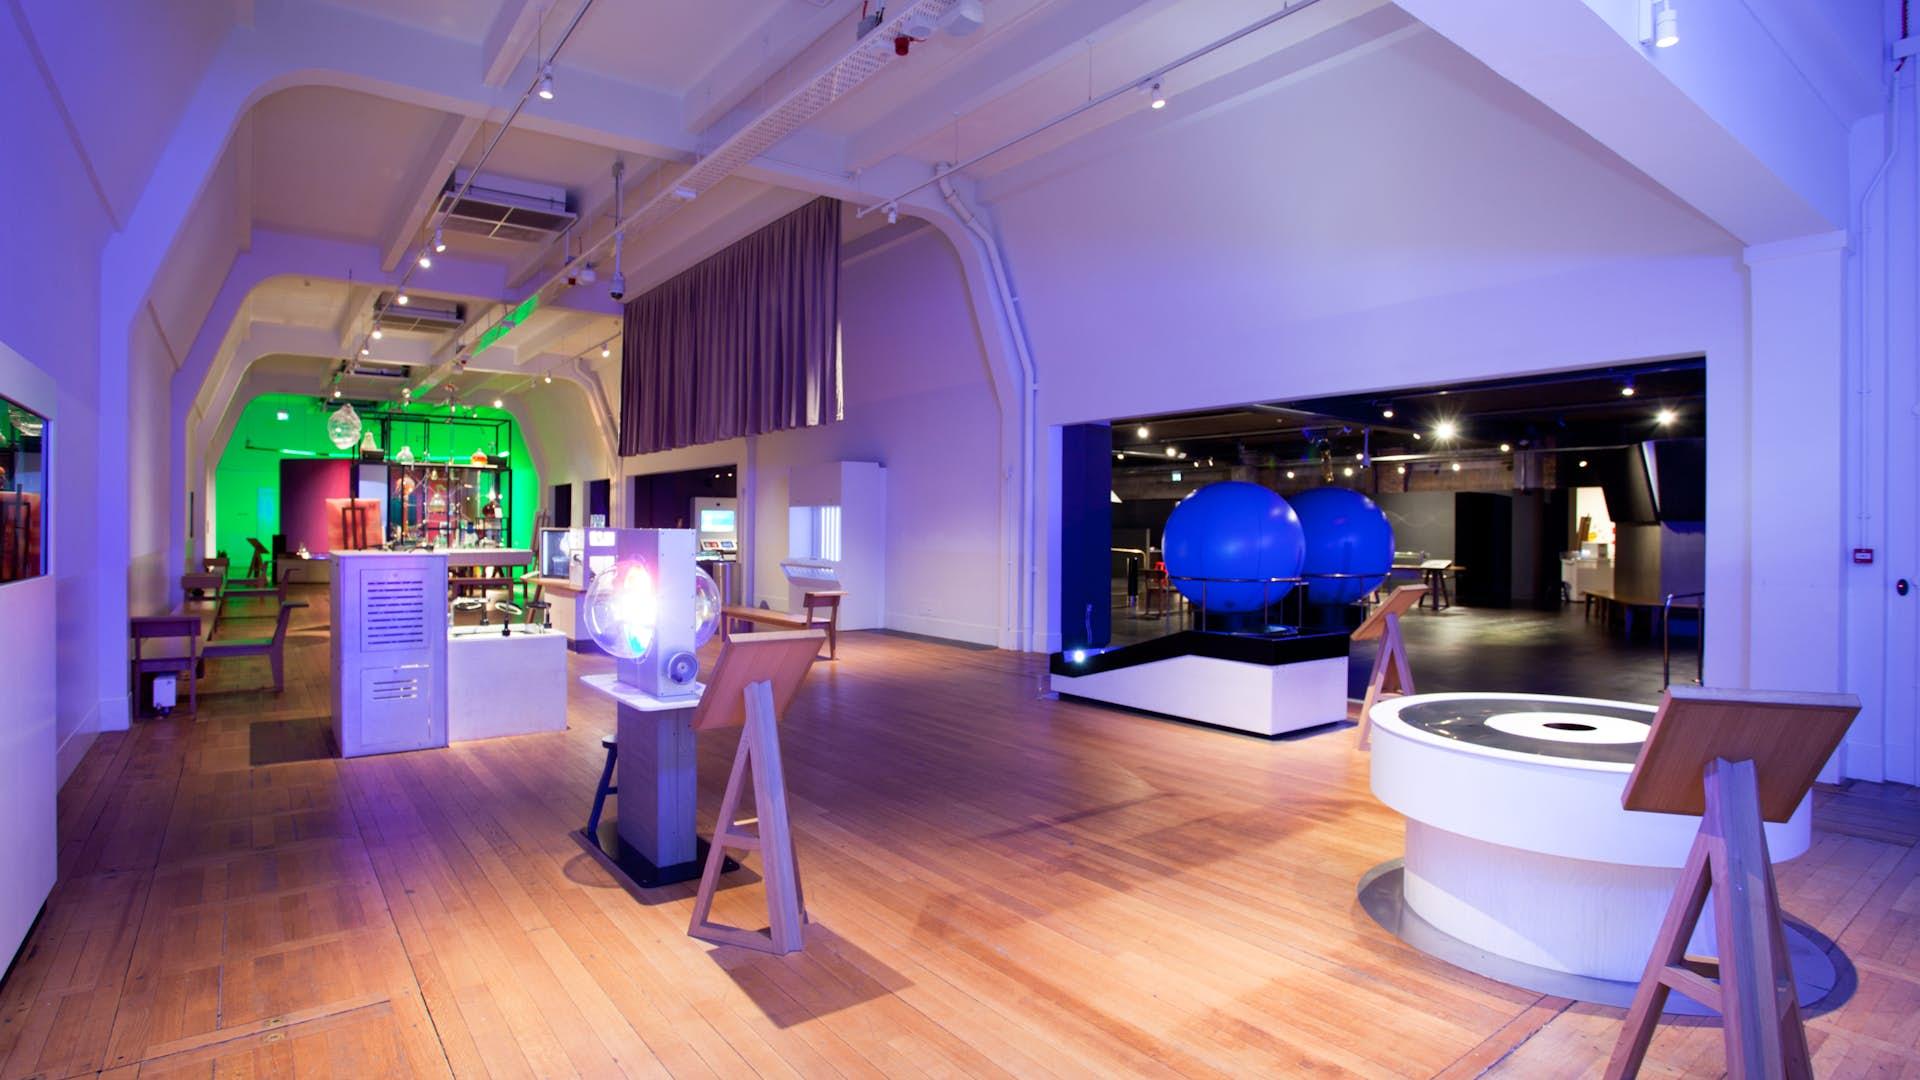 Image result for science museum london wonderlab